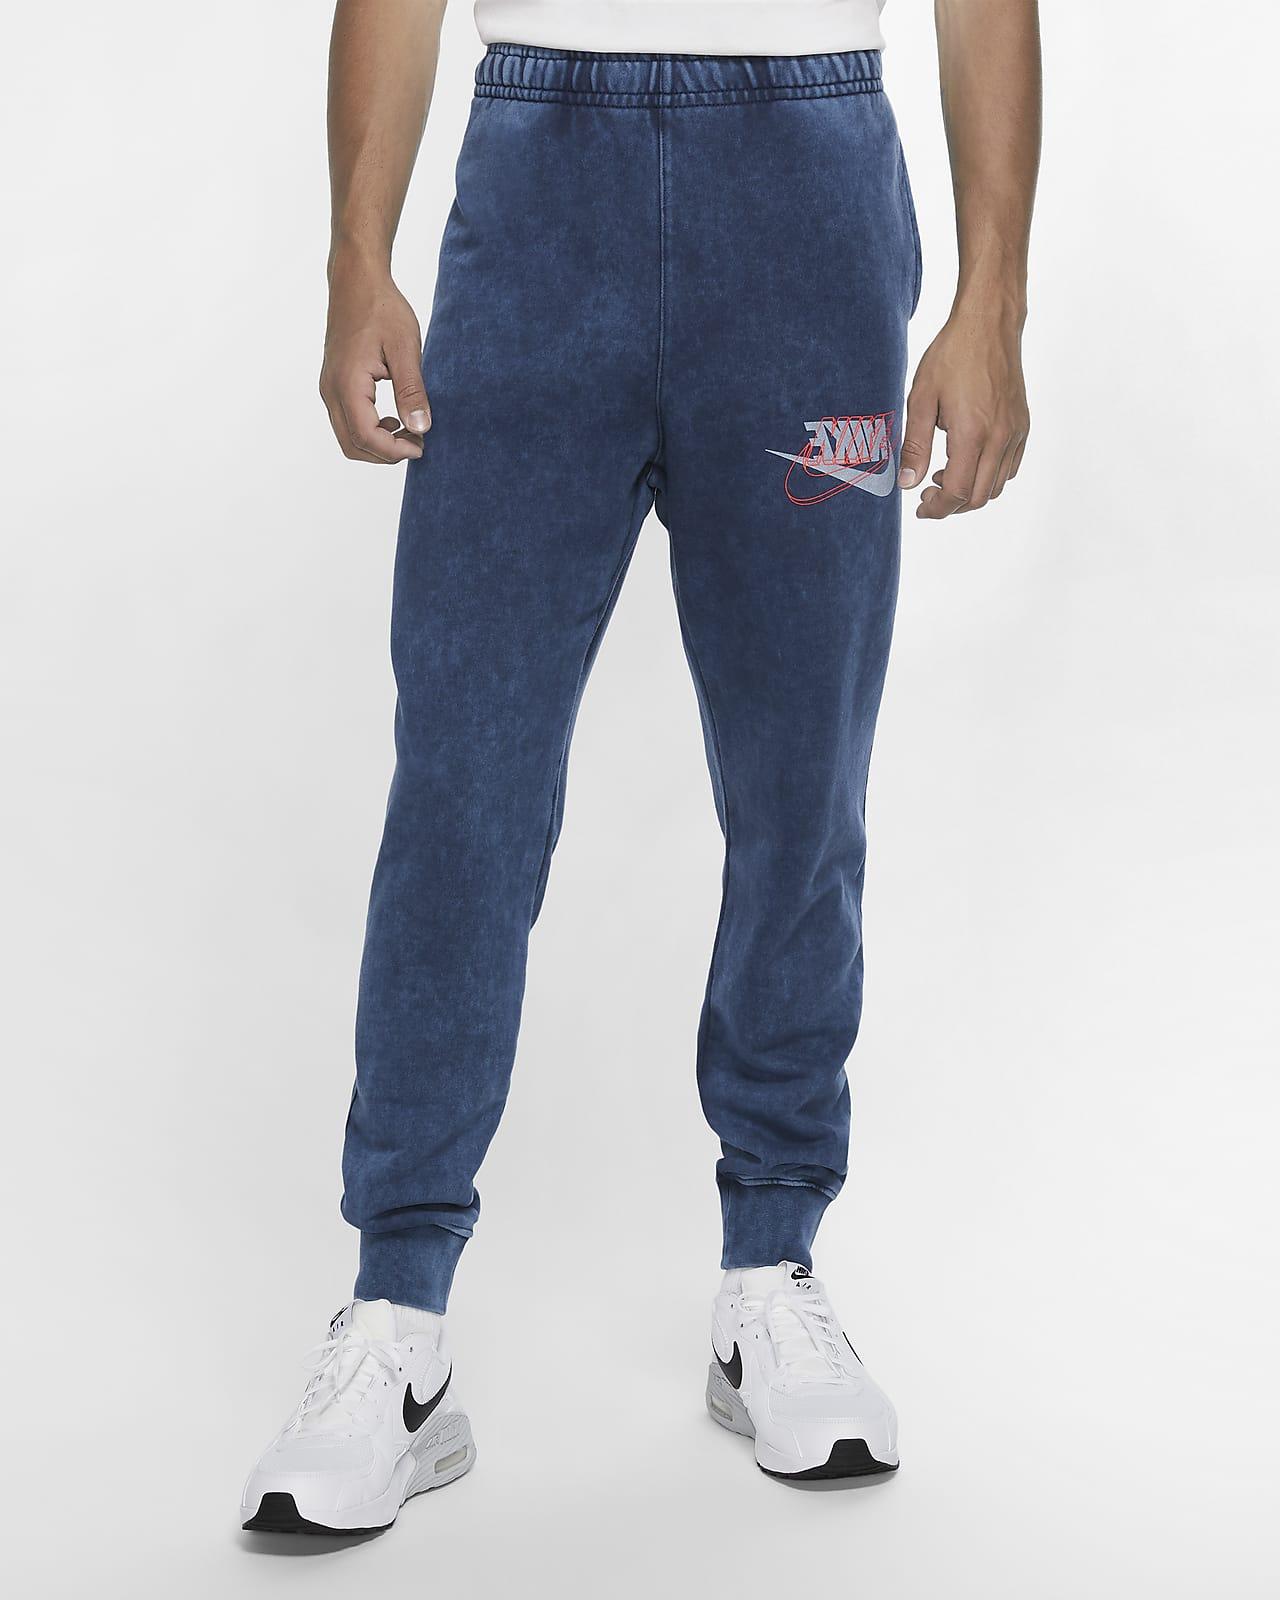 Nike Sportswear Men's French Terry Joggers